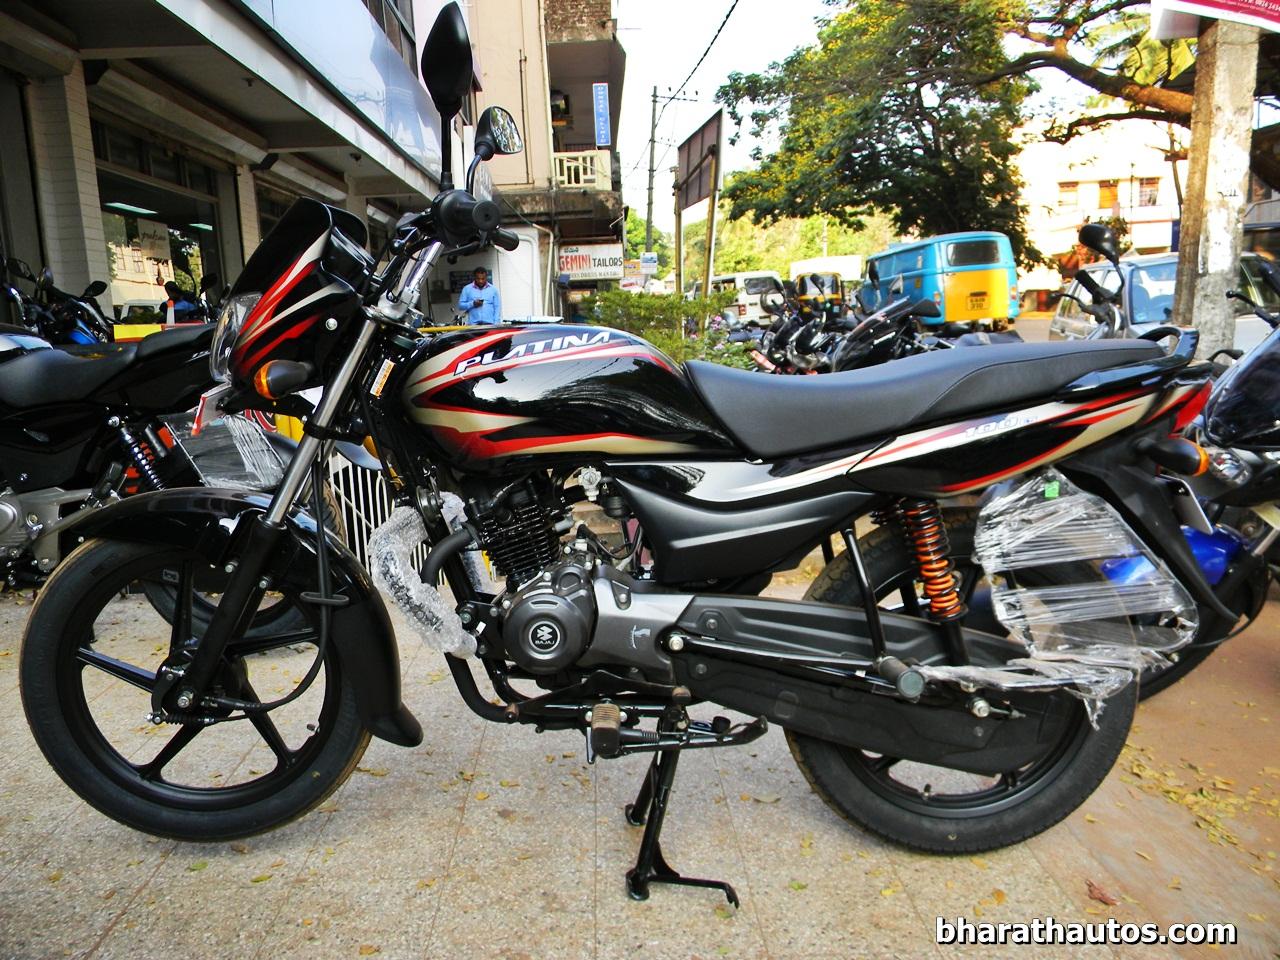 One Of The Best Bike Under Rupees 50,000 - BAJAJ PLATINA 100